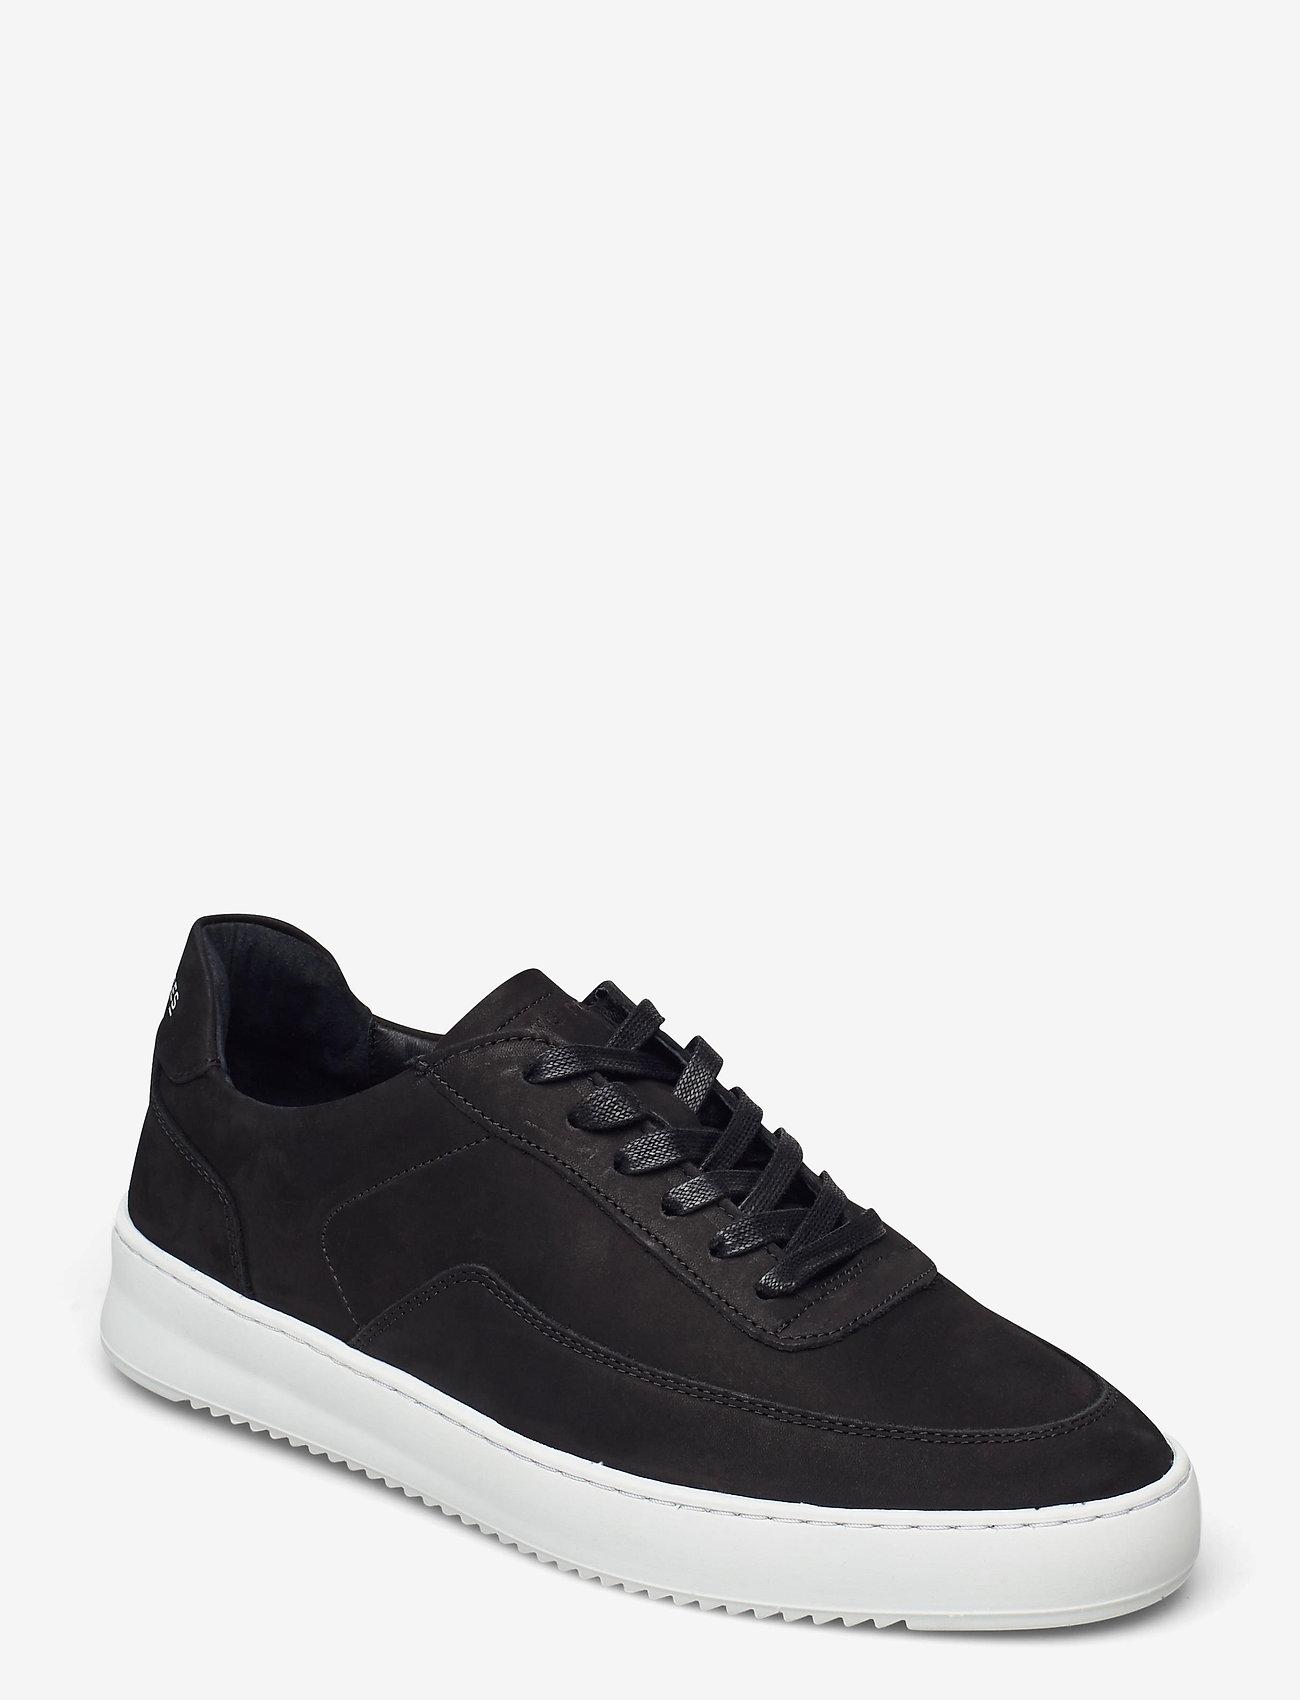 Filling Pieces - Mondo 2.0 Ripple Nubuck - låga sneakers - black - 1